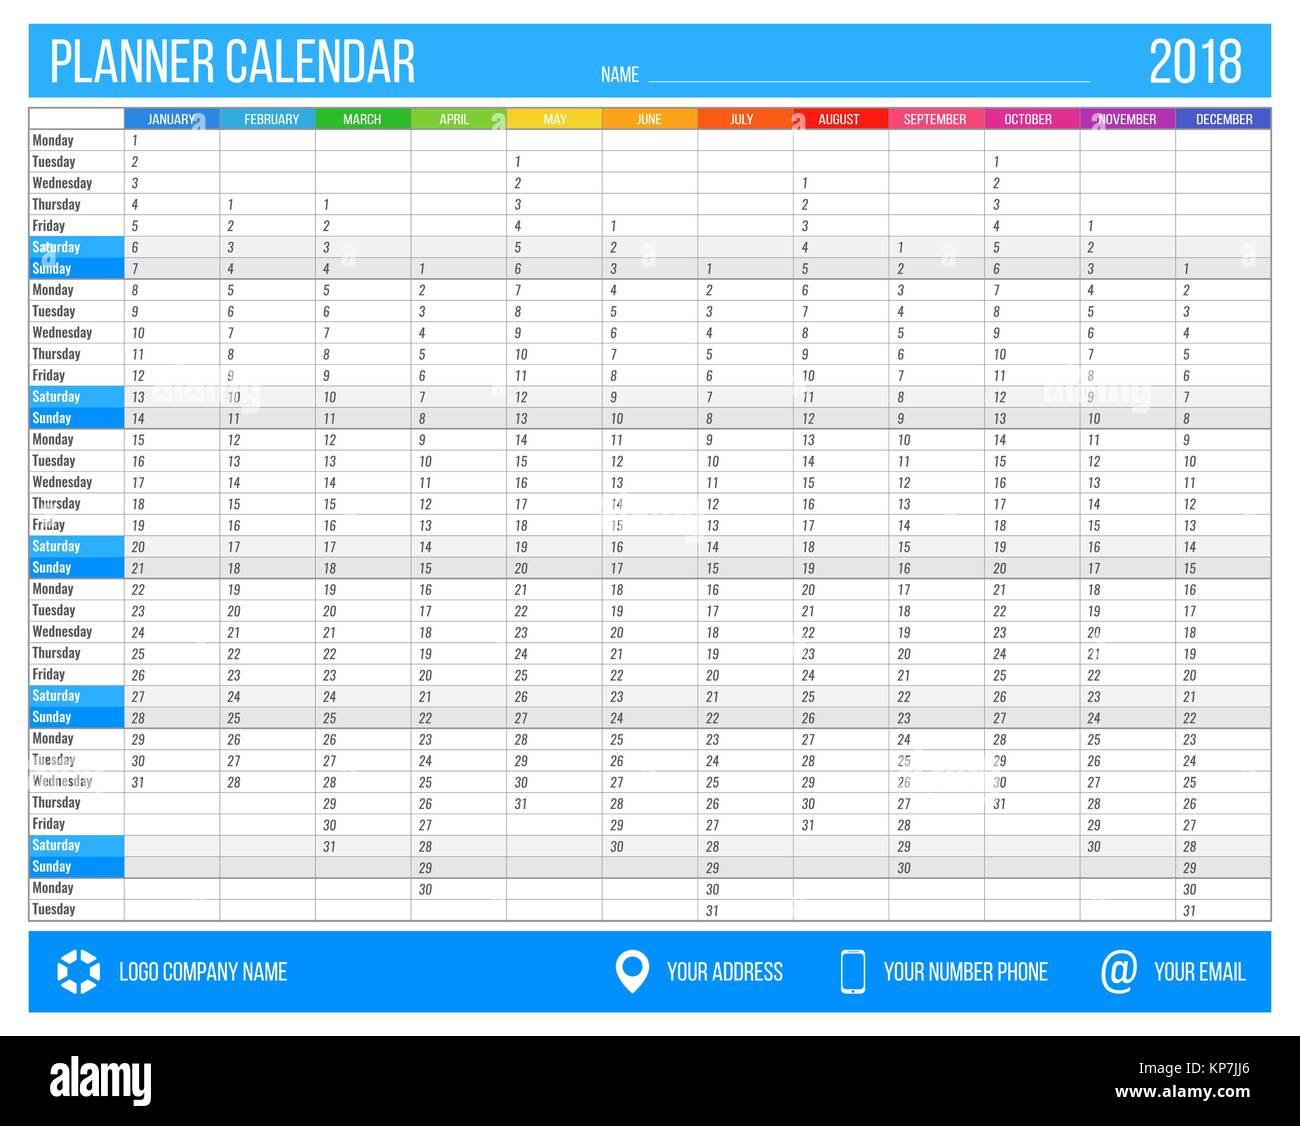 Html Calendar Planner Code : Calender january stock photos